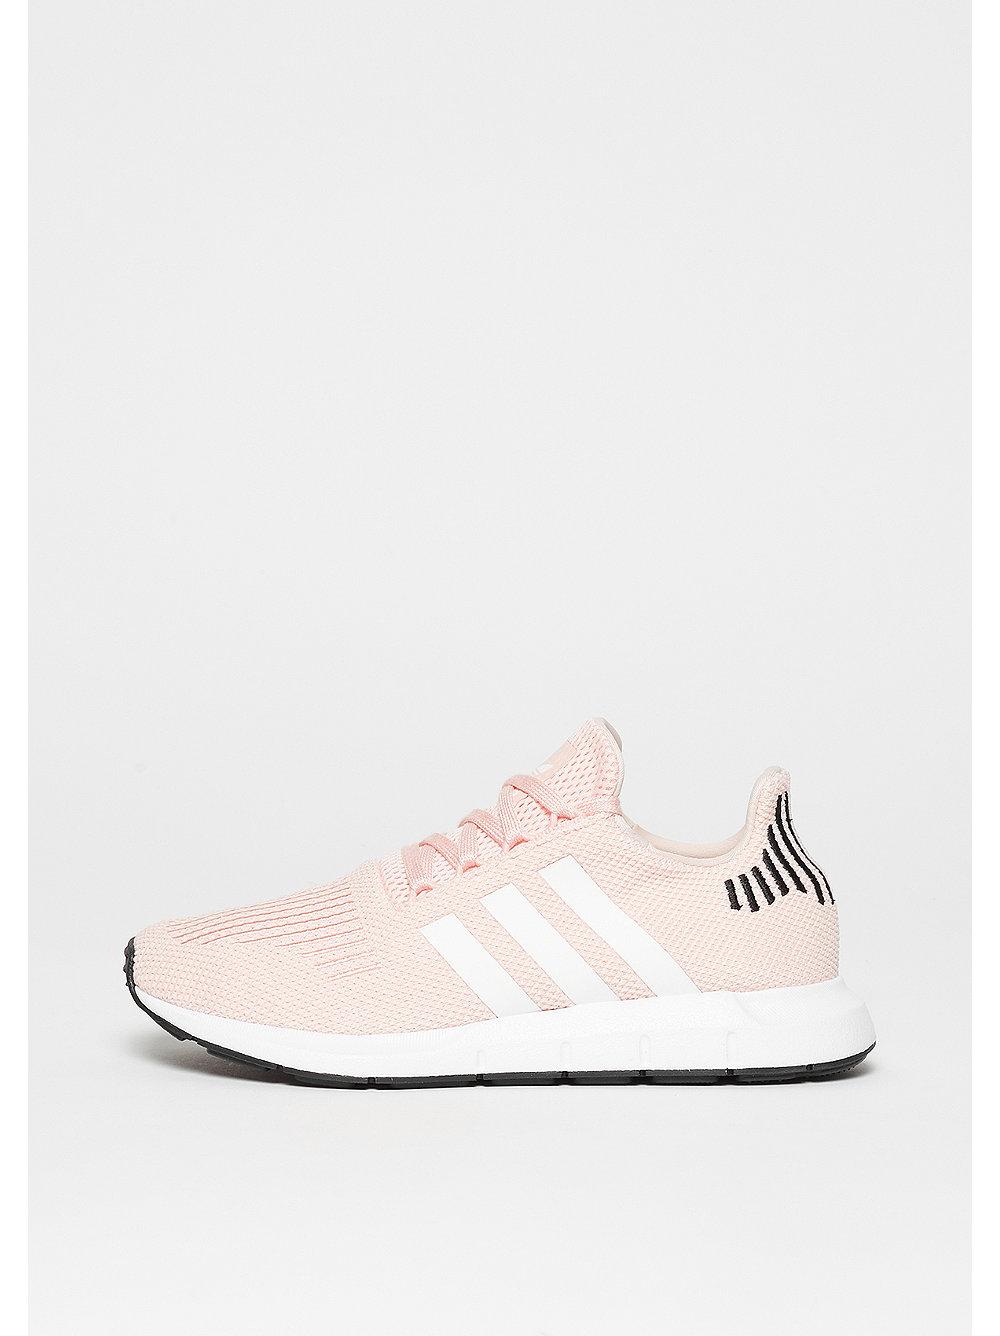 Swift Run icey pink/ftwr white/core black